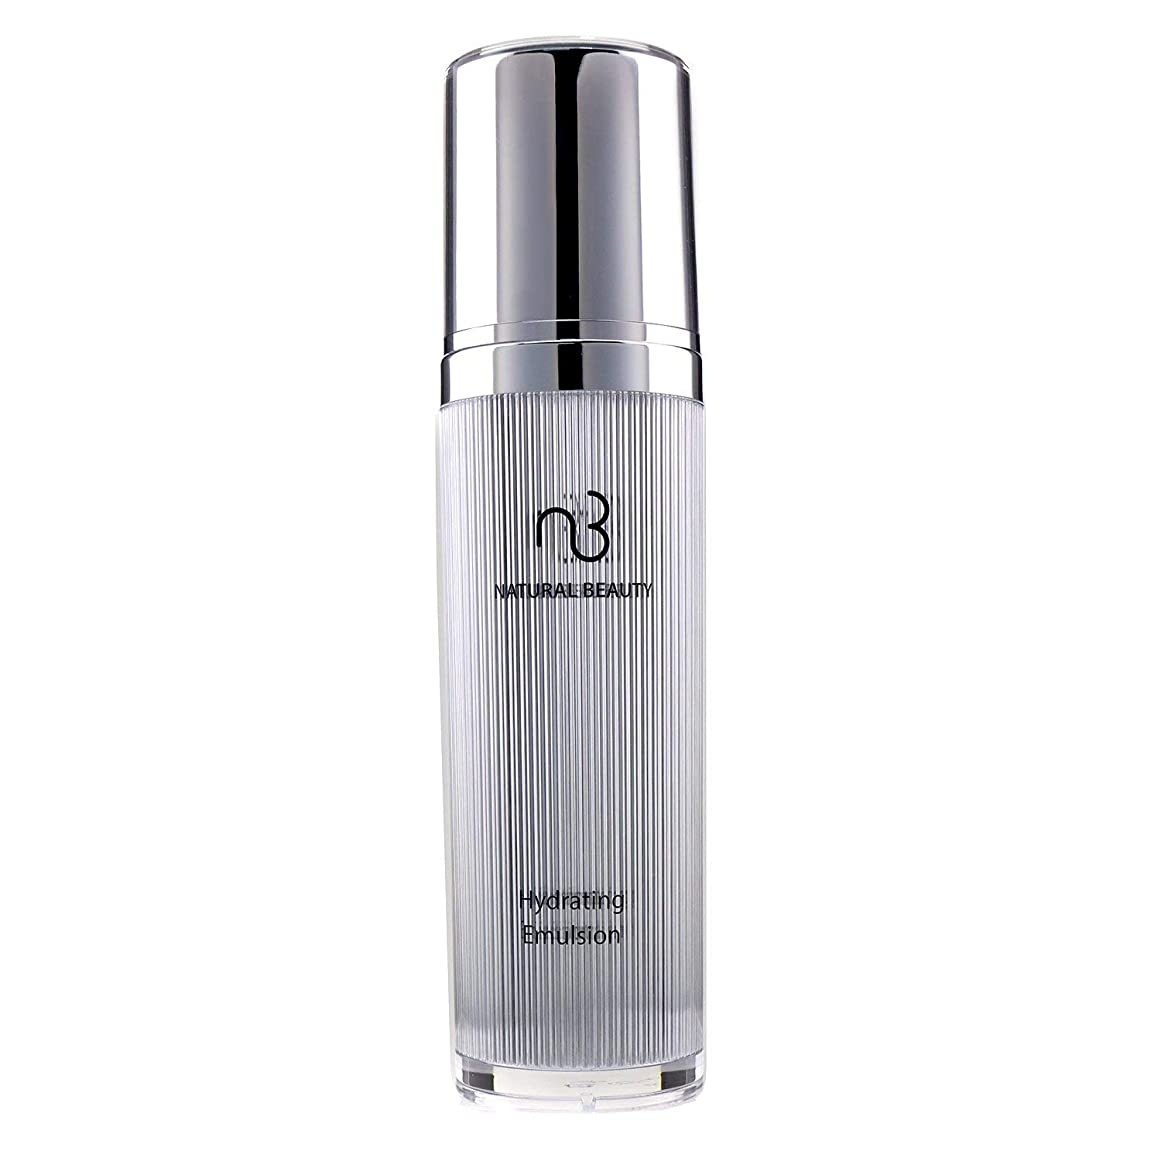 Natural Beauty Hydrating Emulsion 120ml/4oz並行輸入品